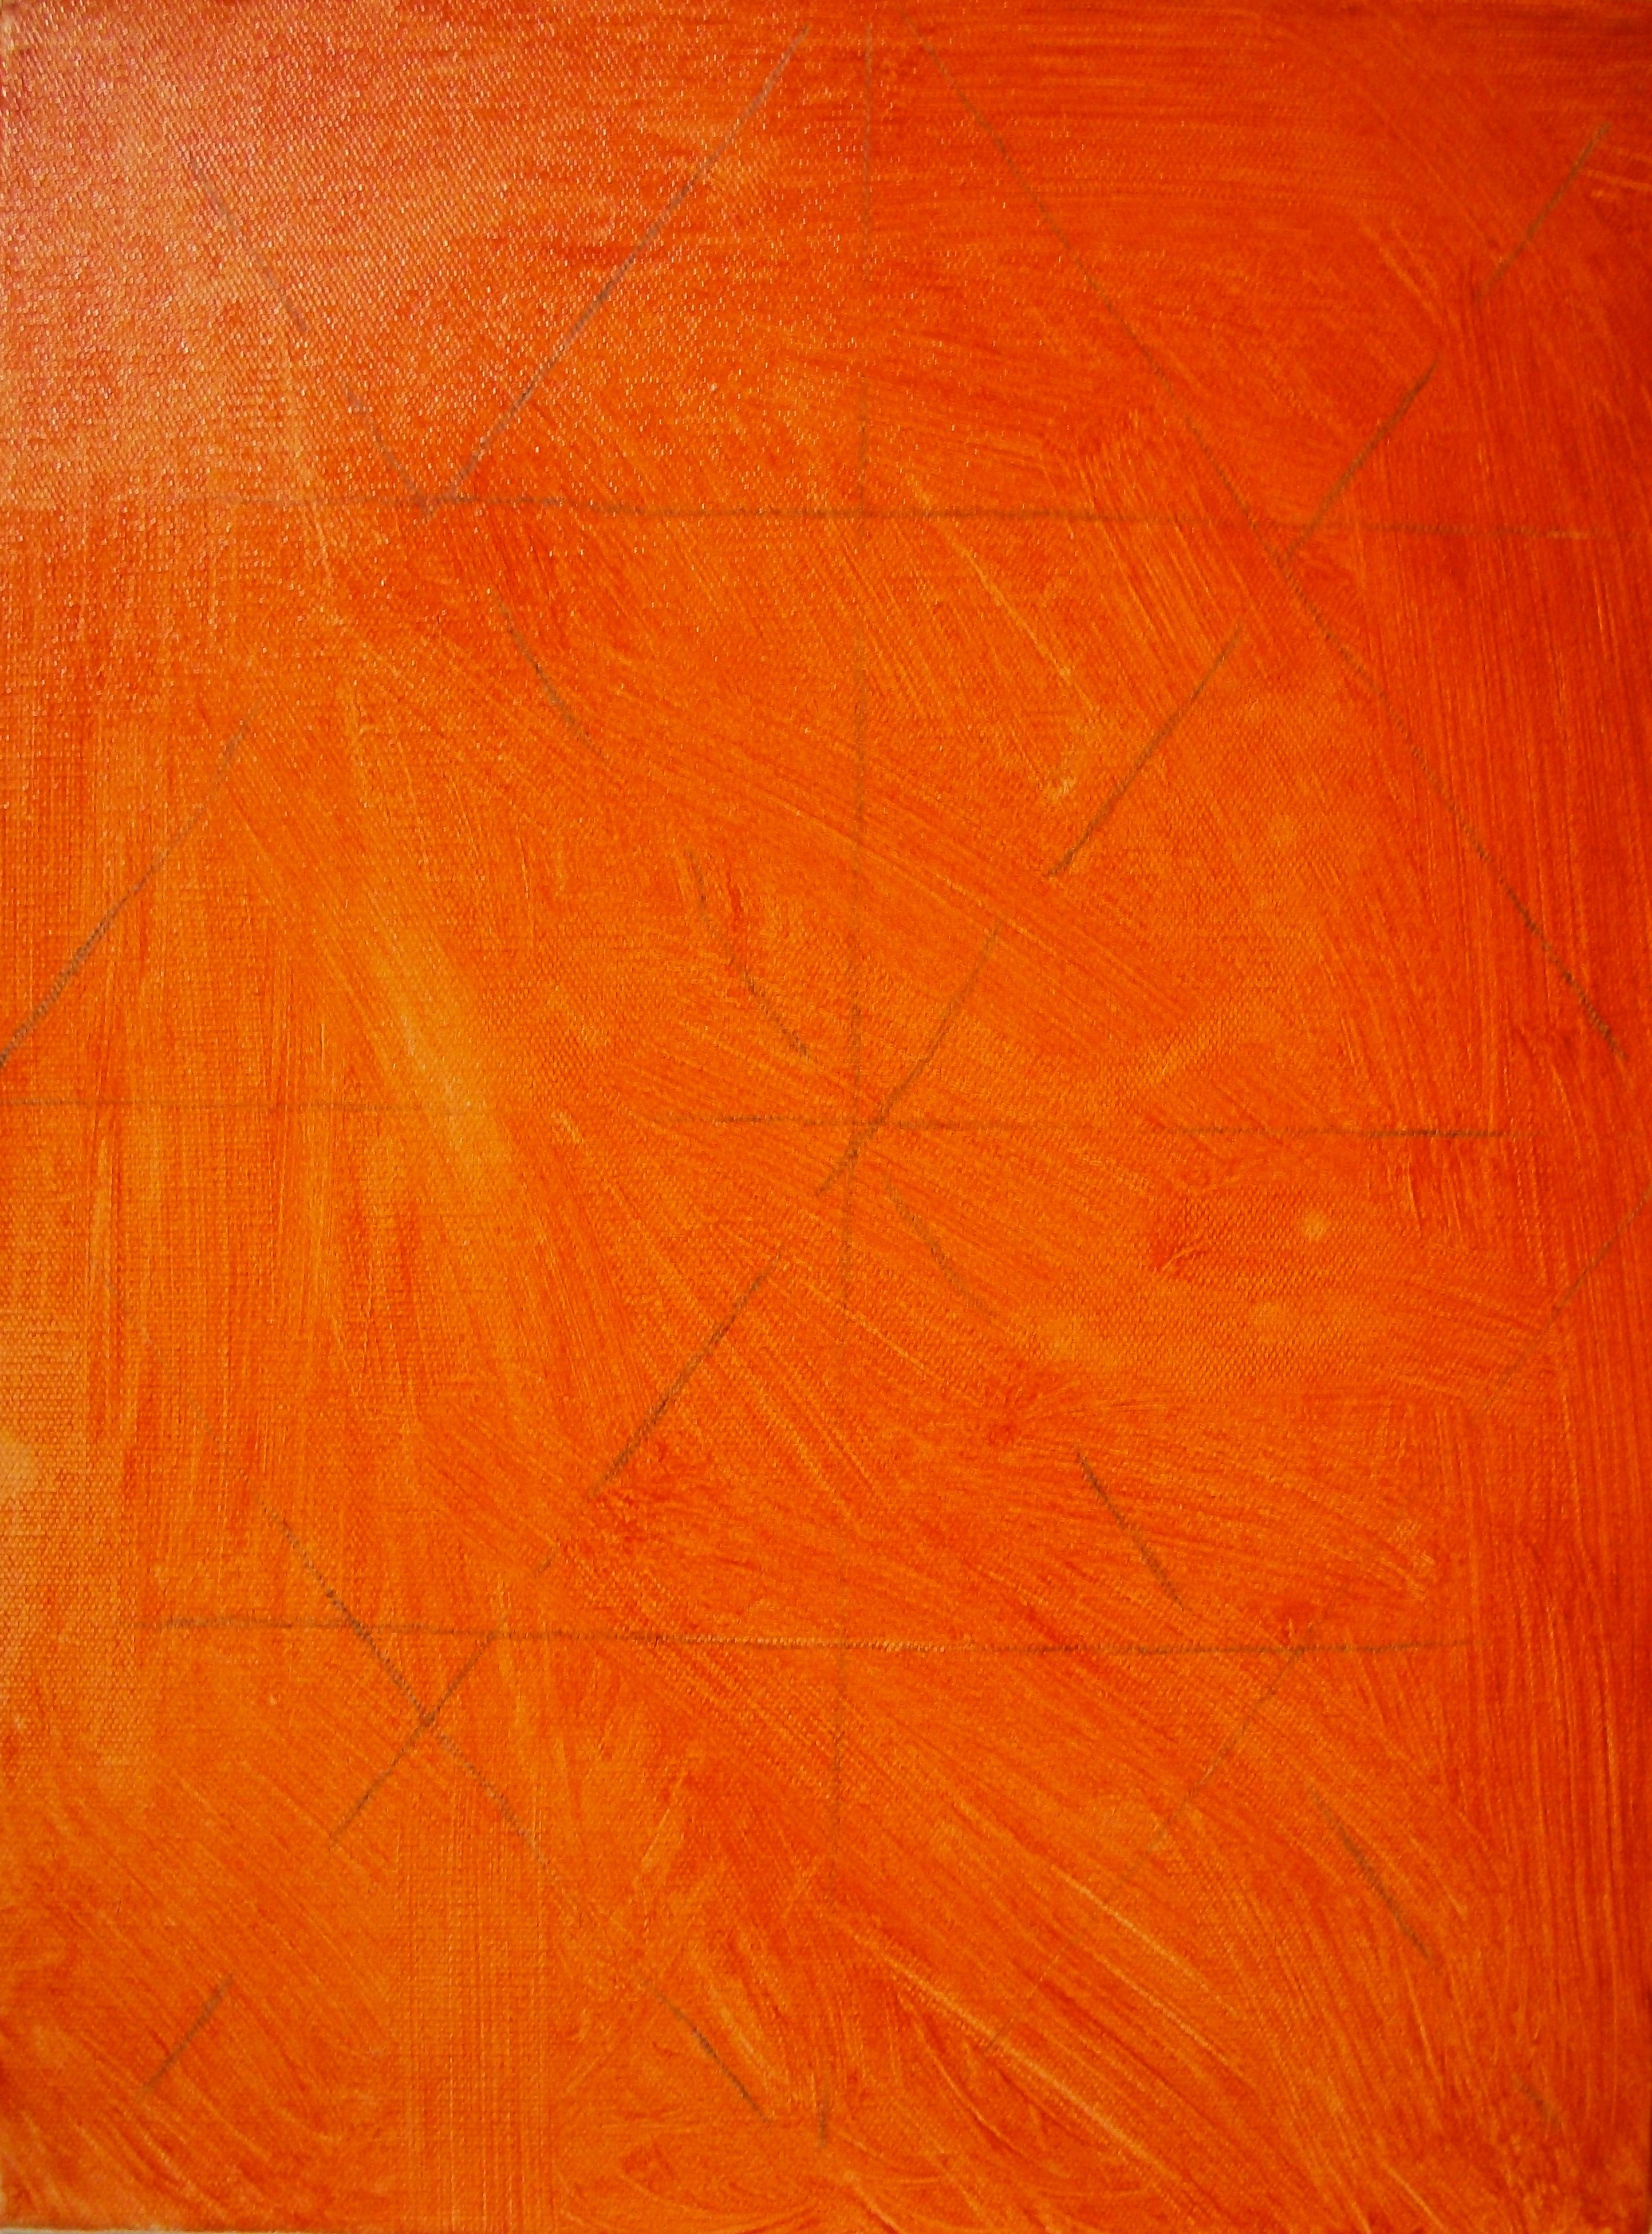 Making Burnt Orange Paint